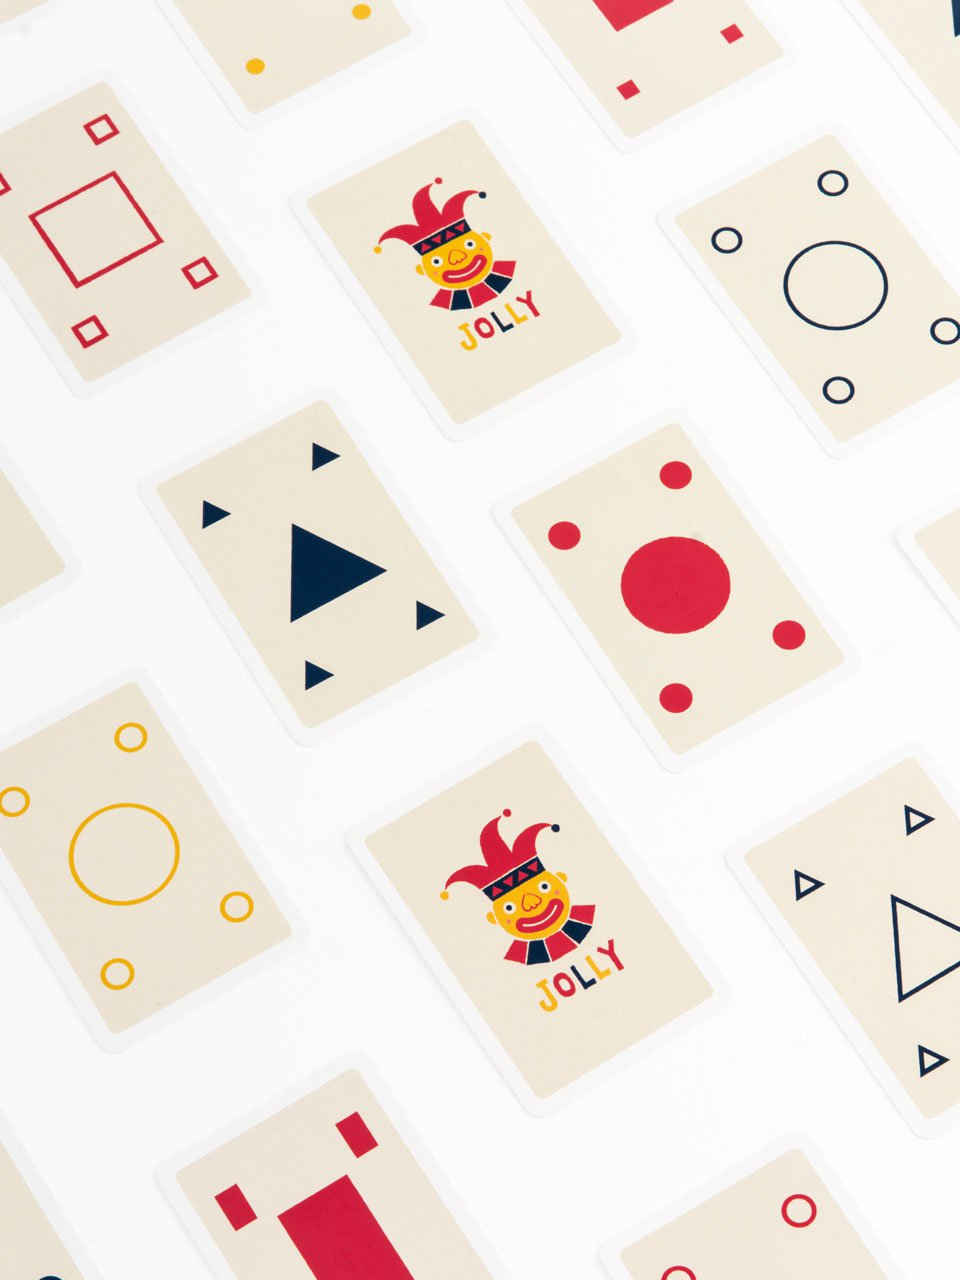 Giochinsieme - Forme e logica - Strumenti - Erickson 3